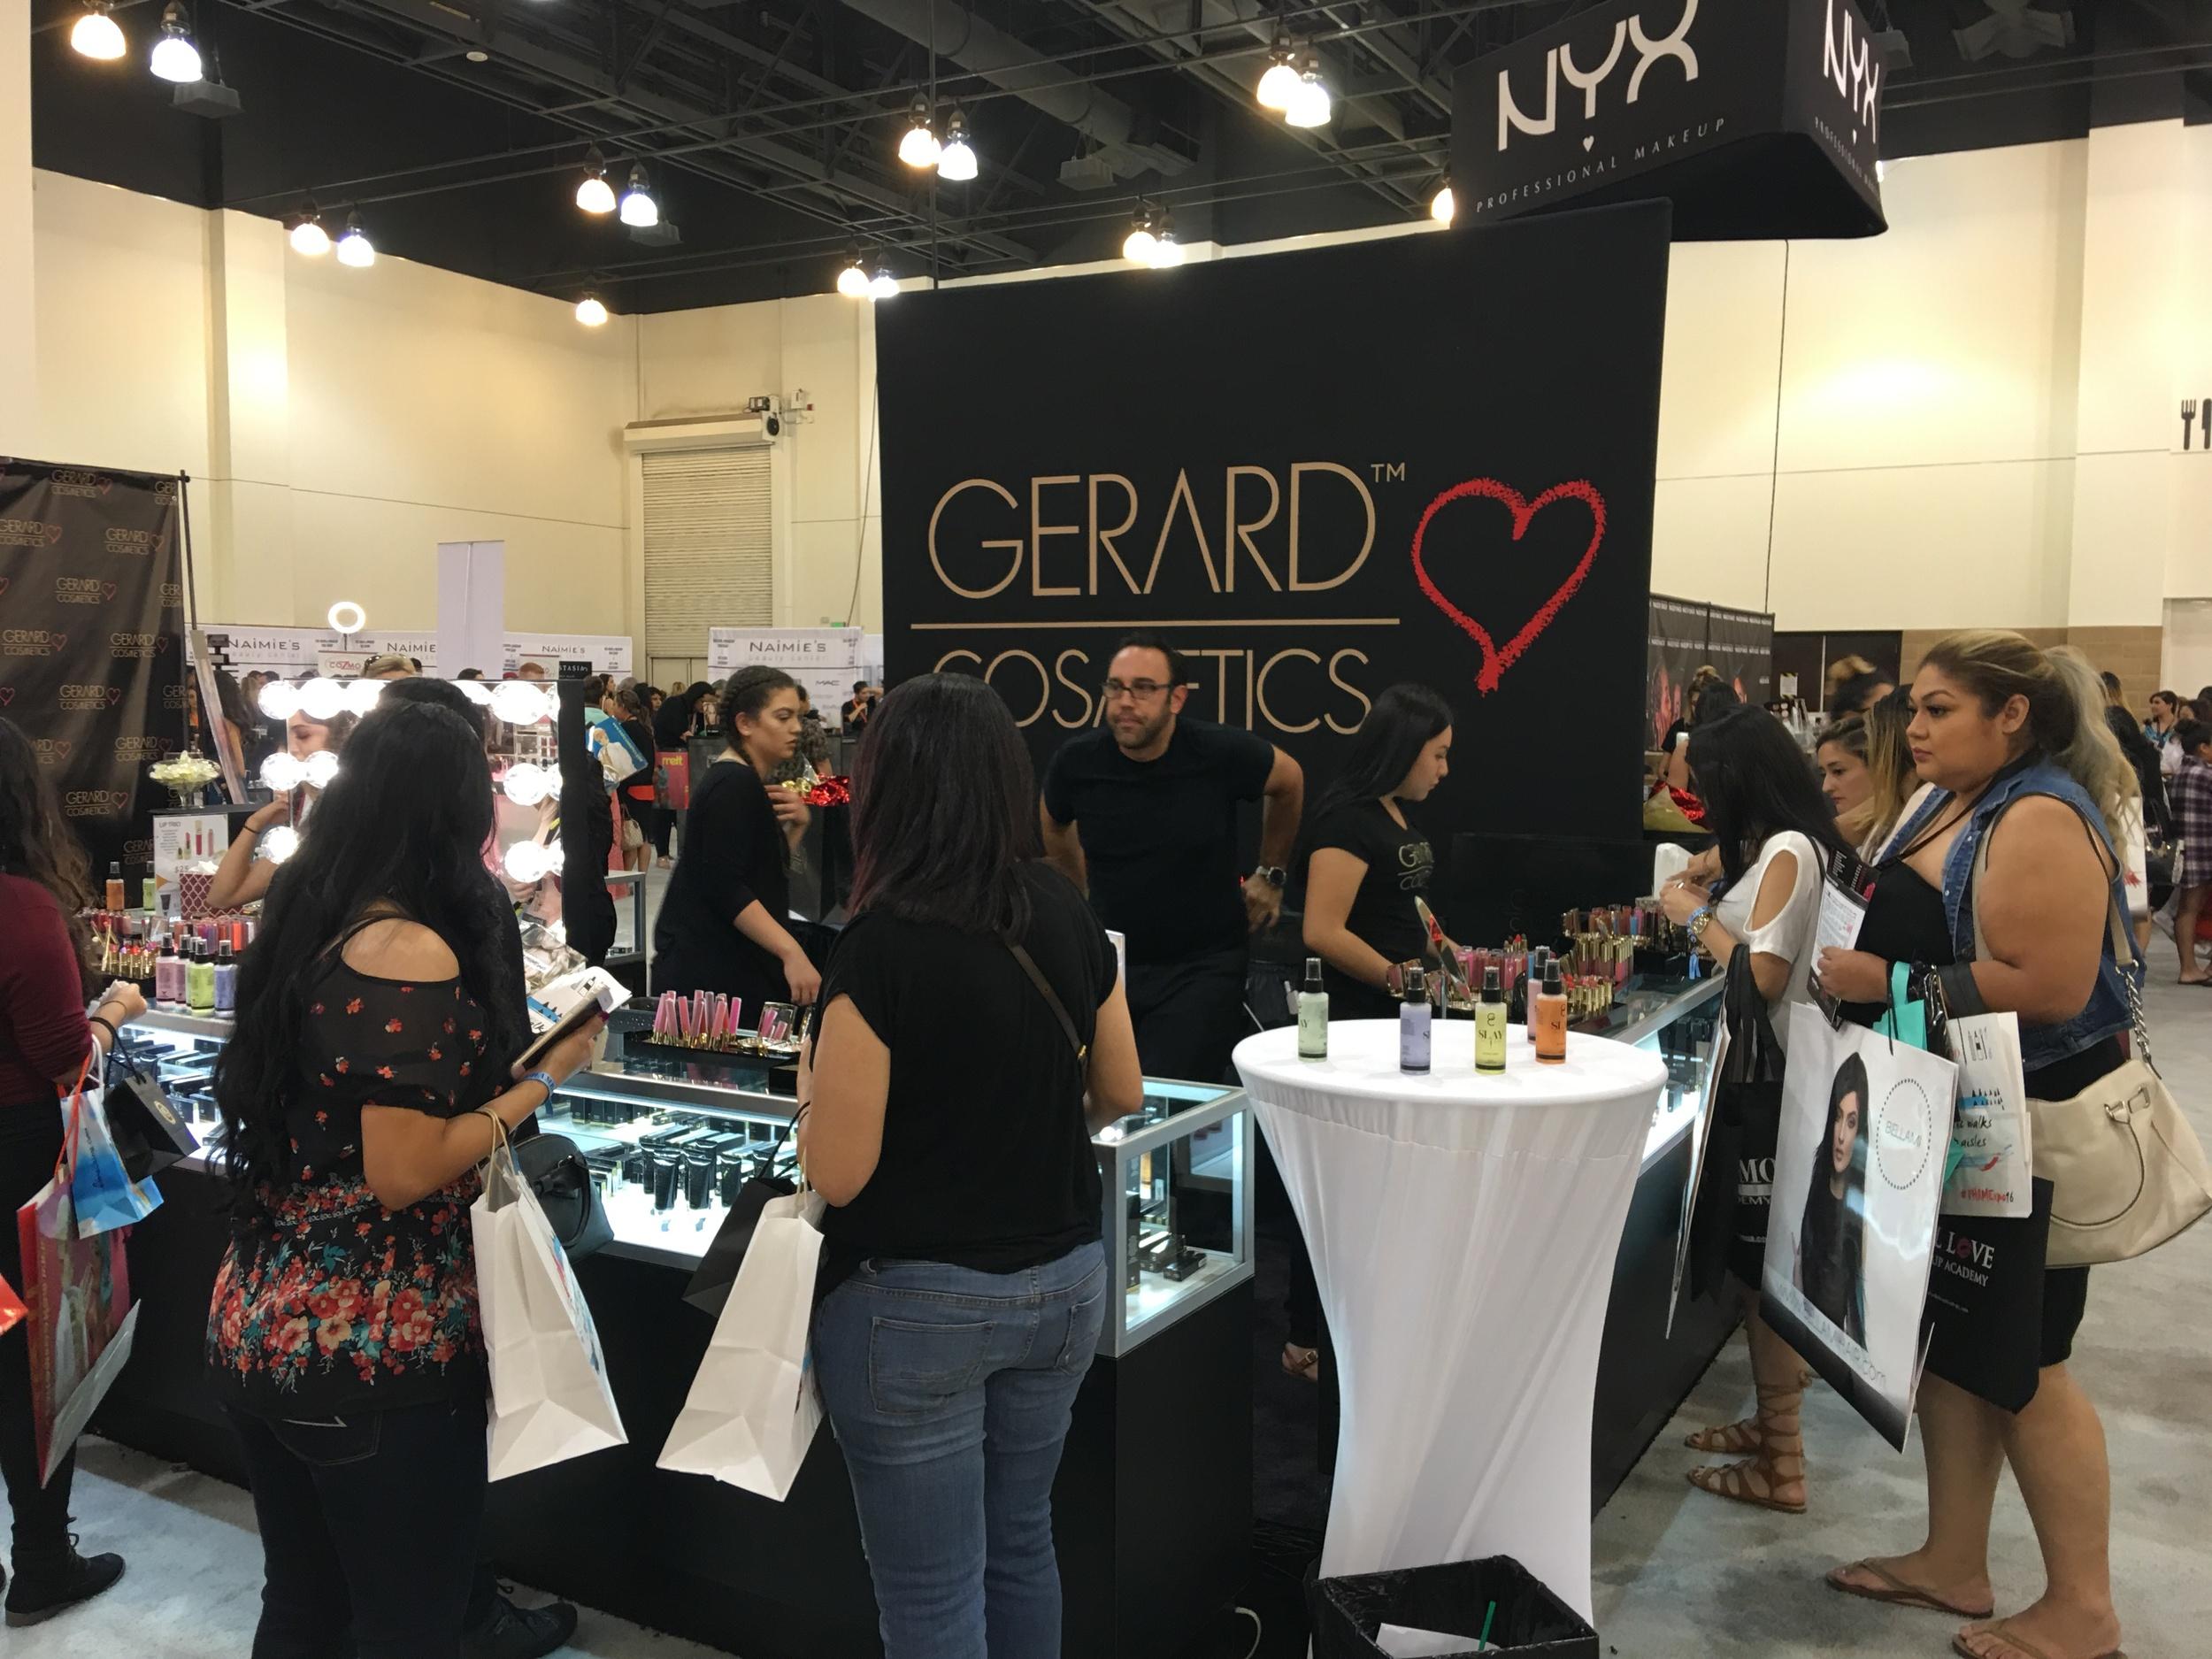 Gerard Cosmetics Booth, PHAMExpo Los Angeles 2016